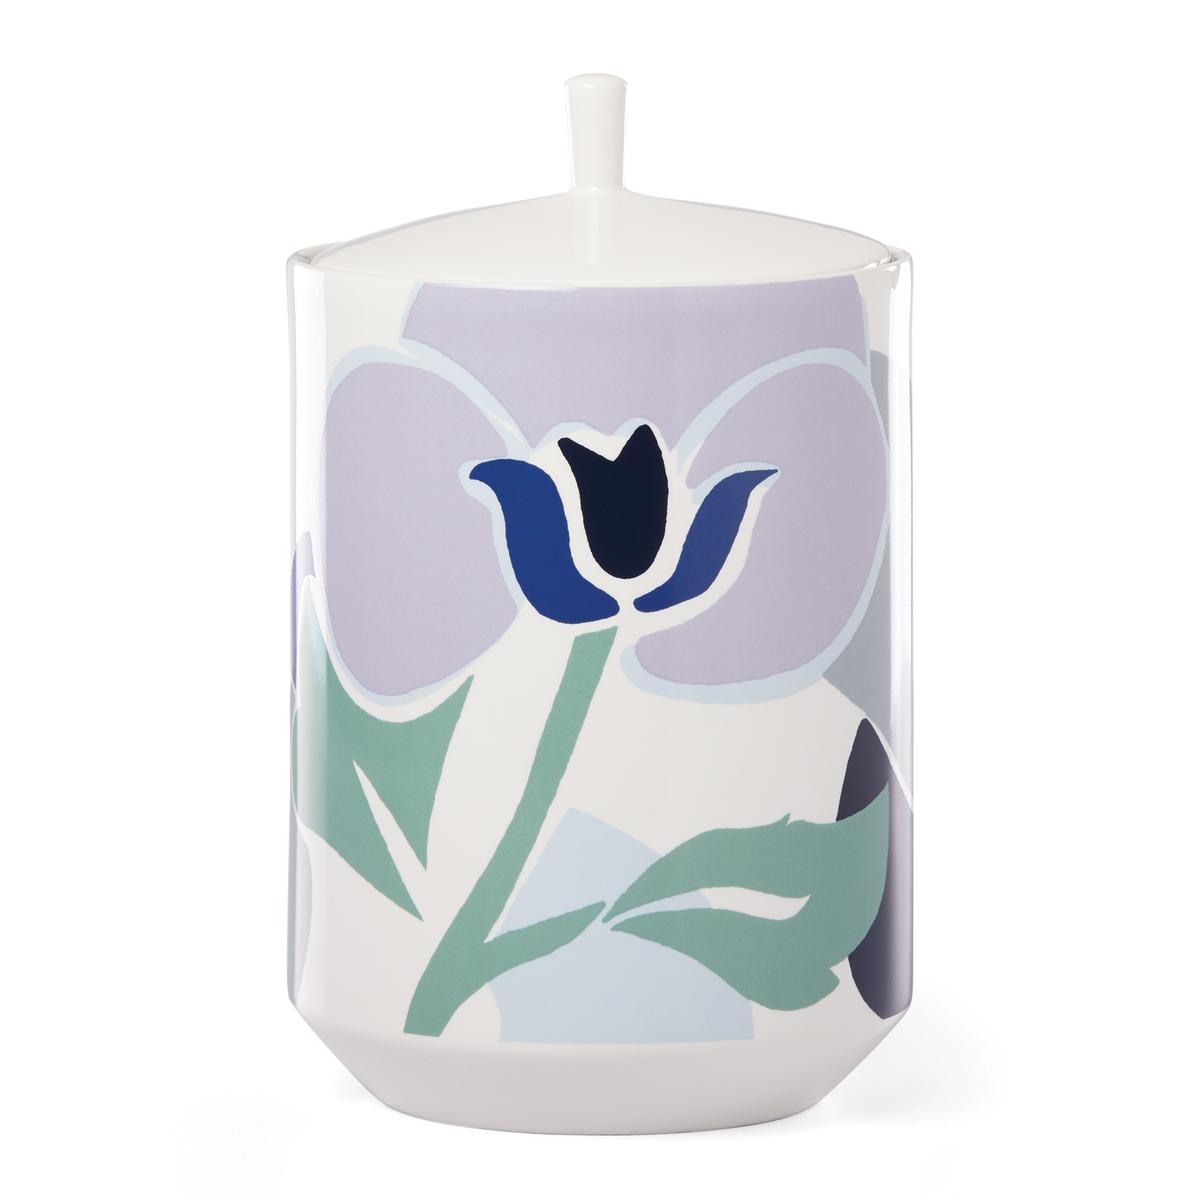 Kate Spade China by Lenox, Stoneware Nolita Blue Floral Cookie Jar